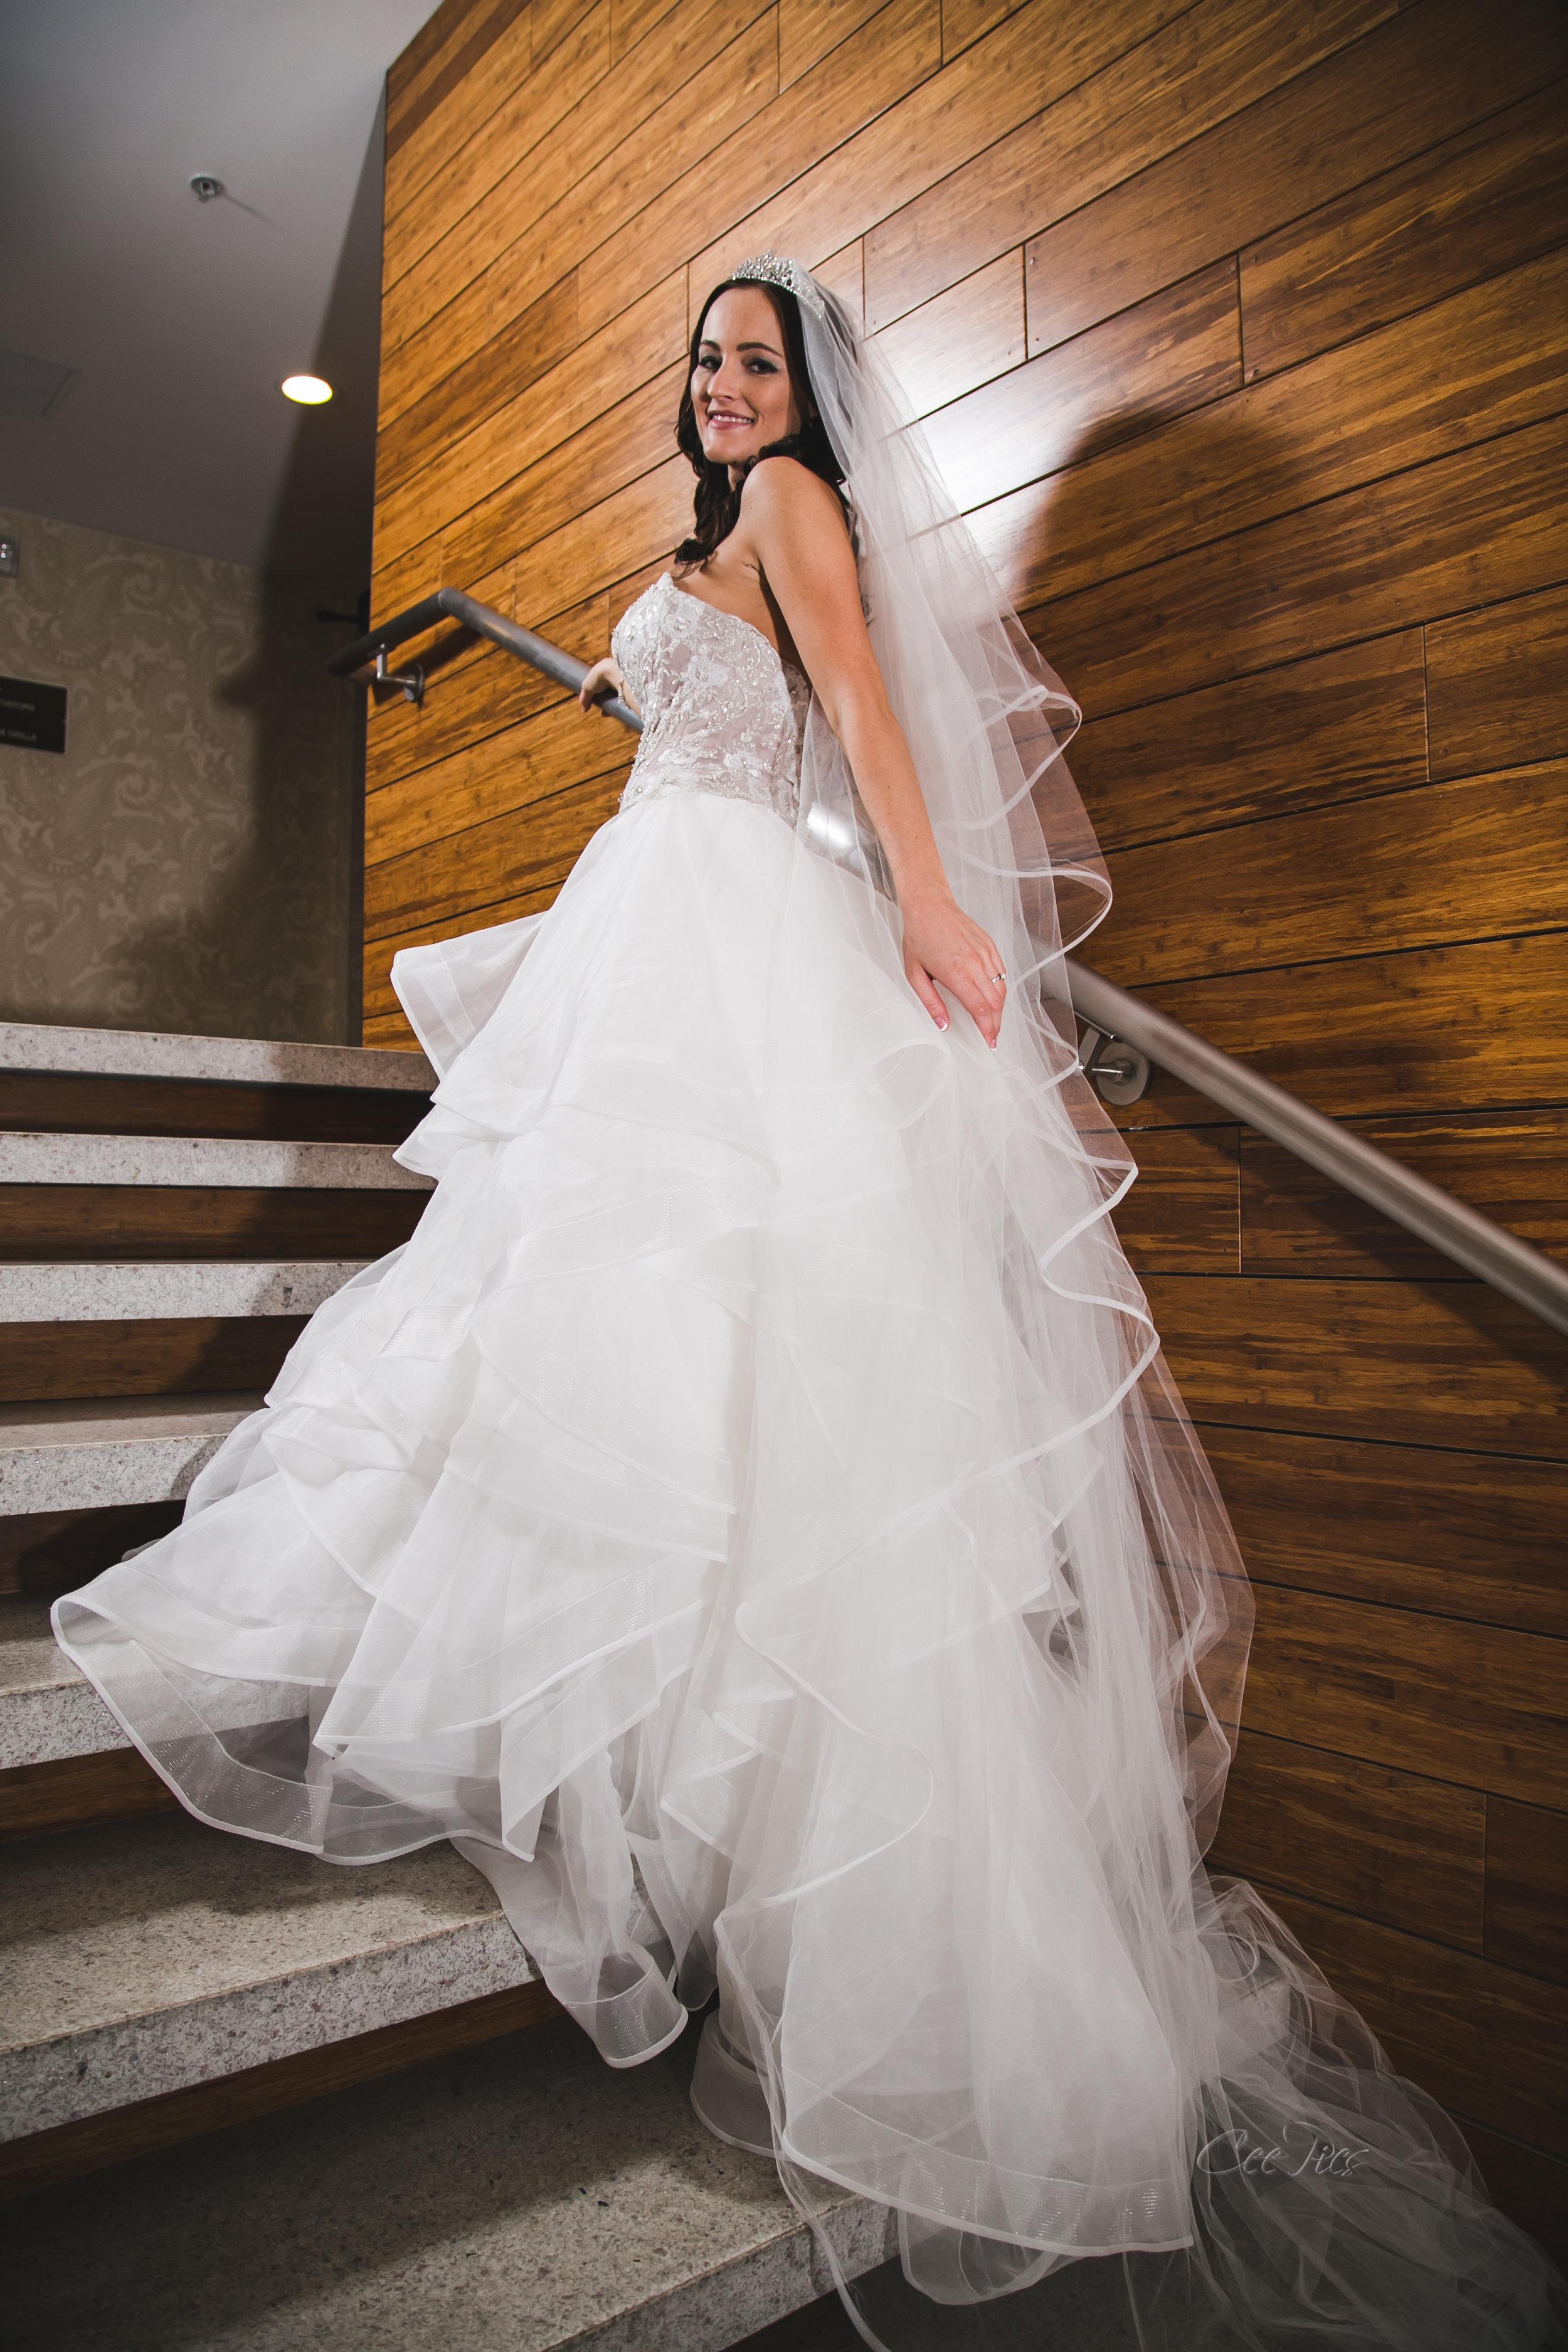 Nashville_Wedding_Photographer_Photography_DJ_MC_Lighting_Photobooth_Franklin_Bowling_Gallatin-42.jpg